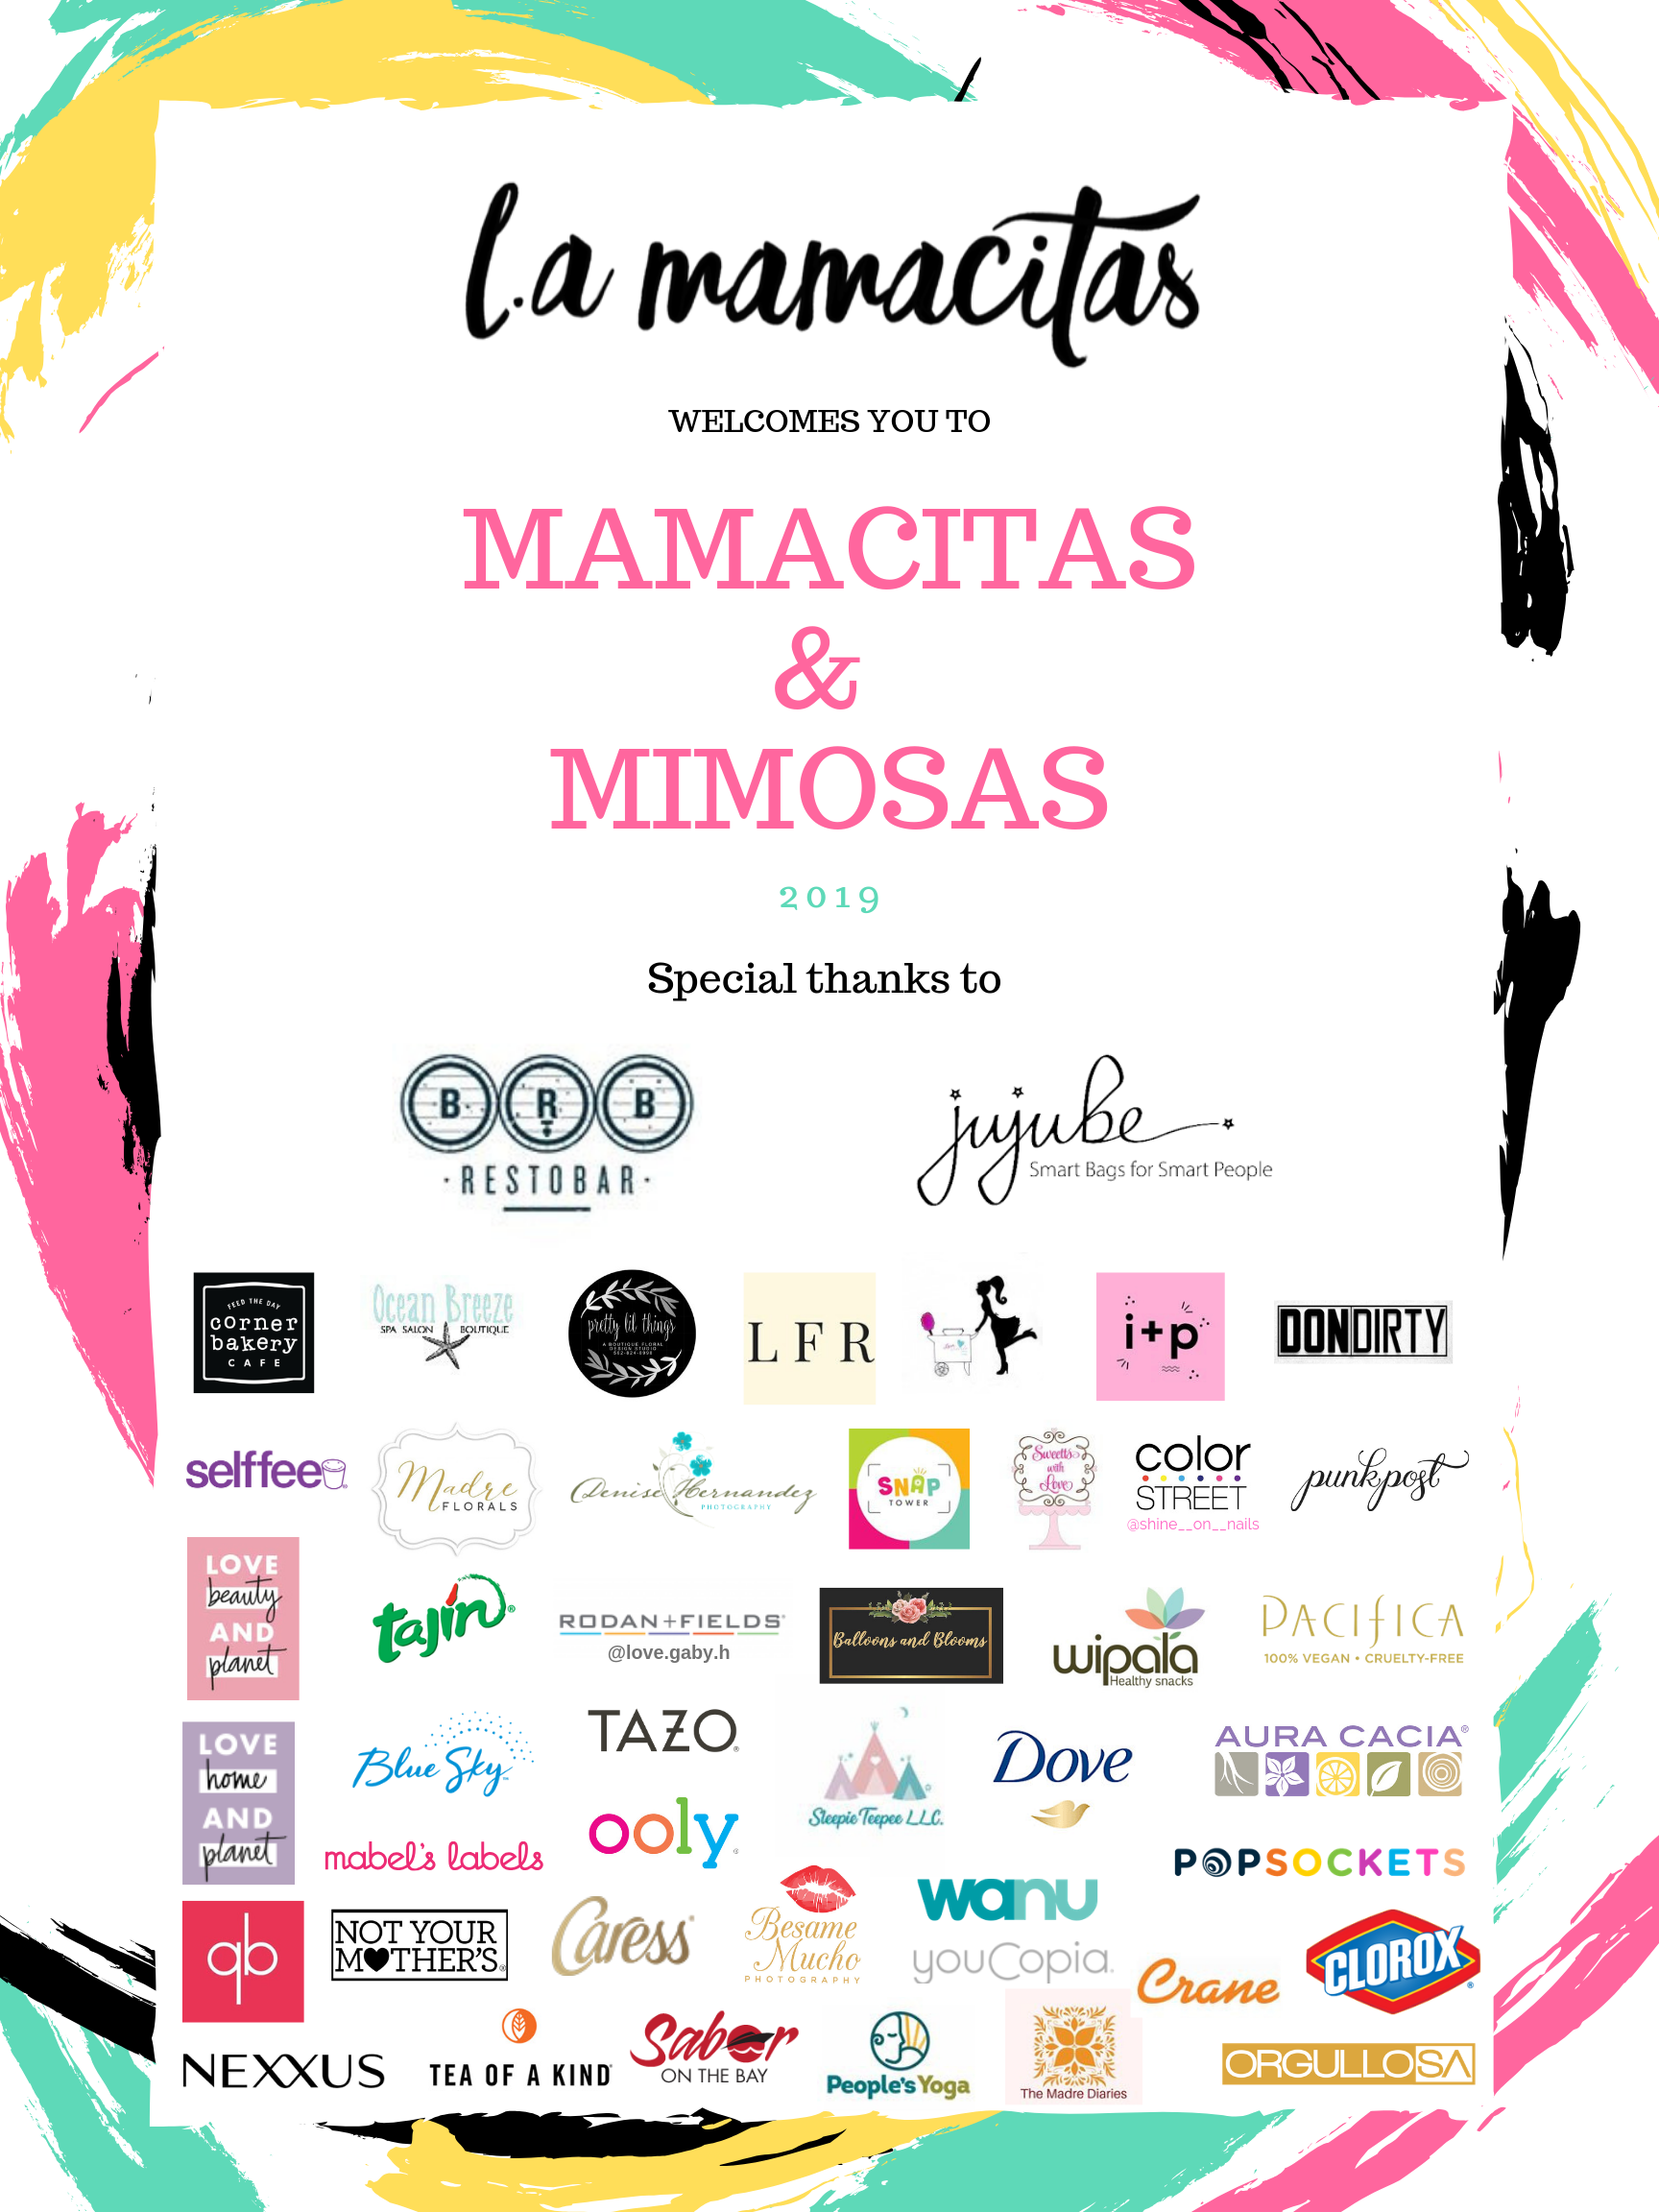 Mamacitas & Mimosas 2019.png